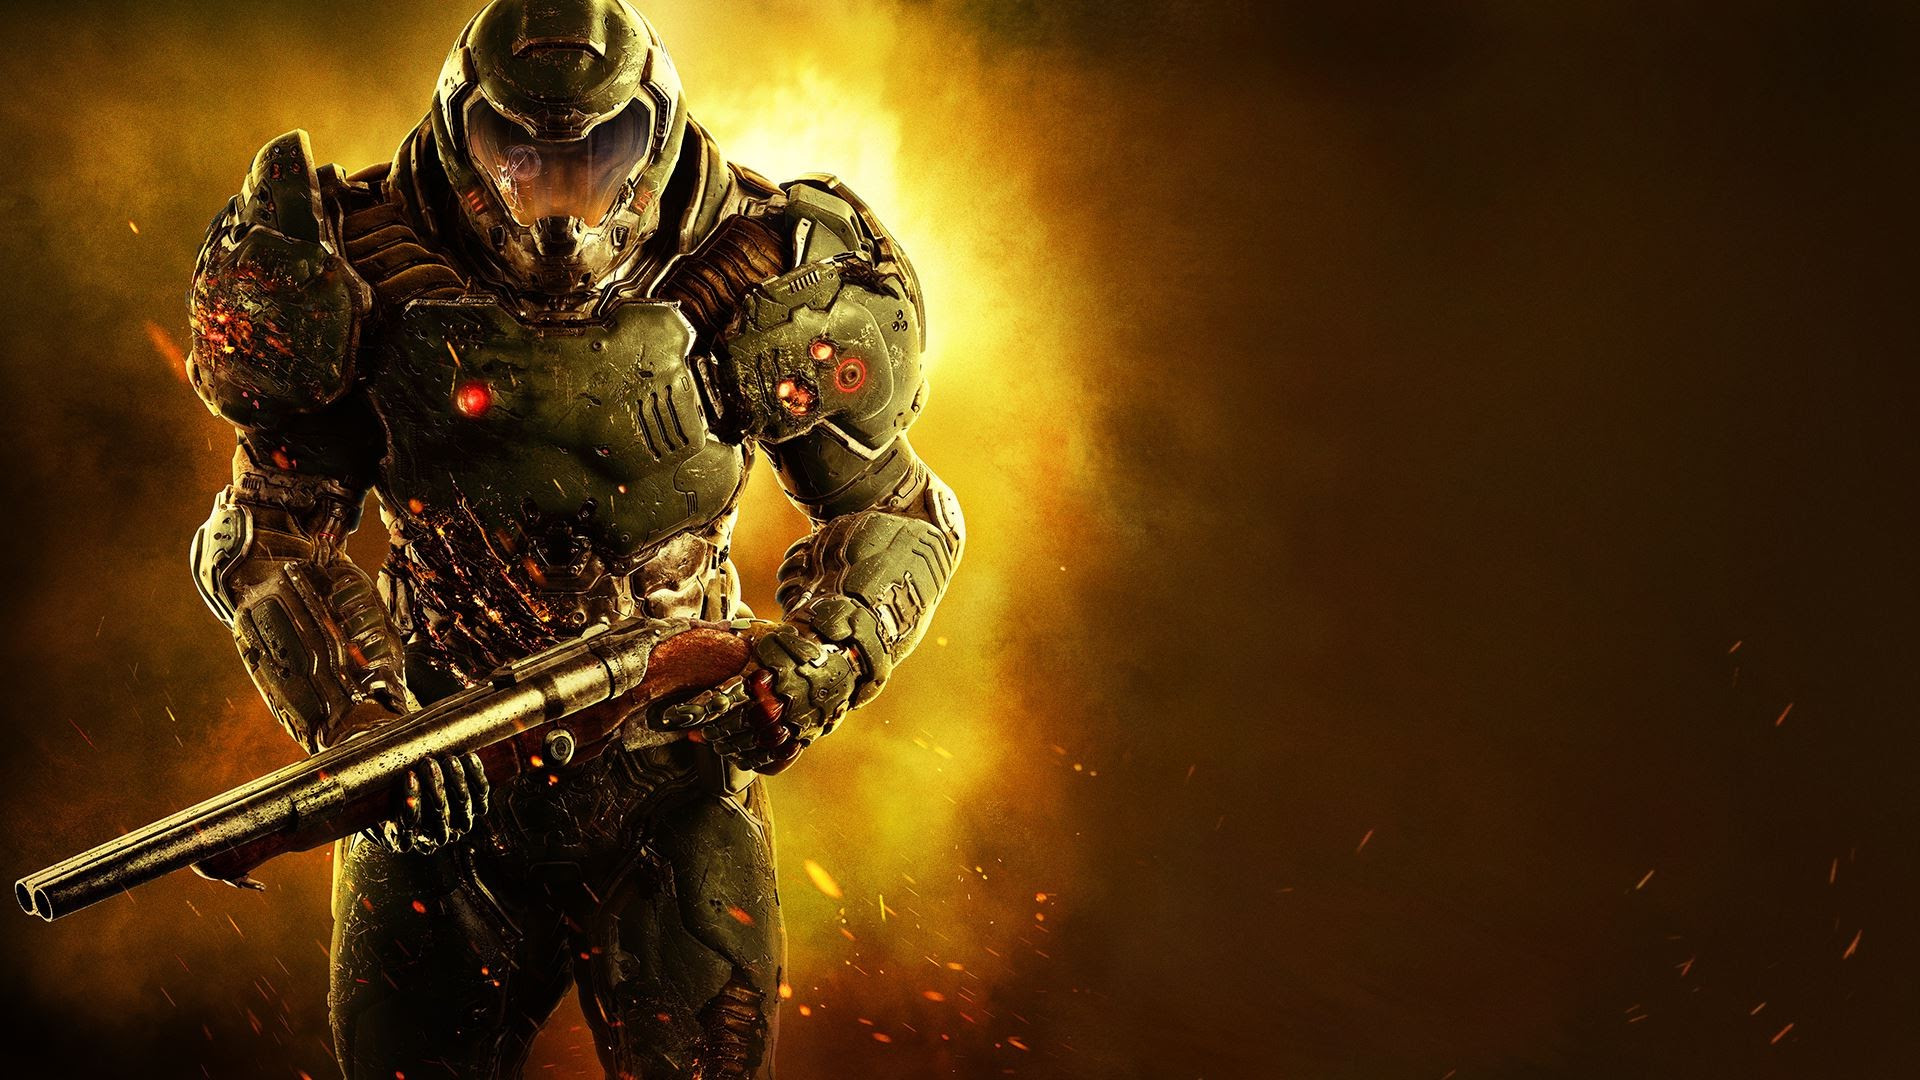 2048x1152 Doom Game HD 2048x1152 Resolution HD 4k